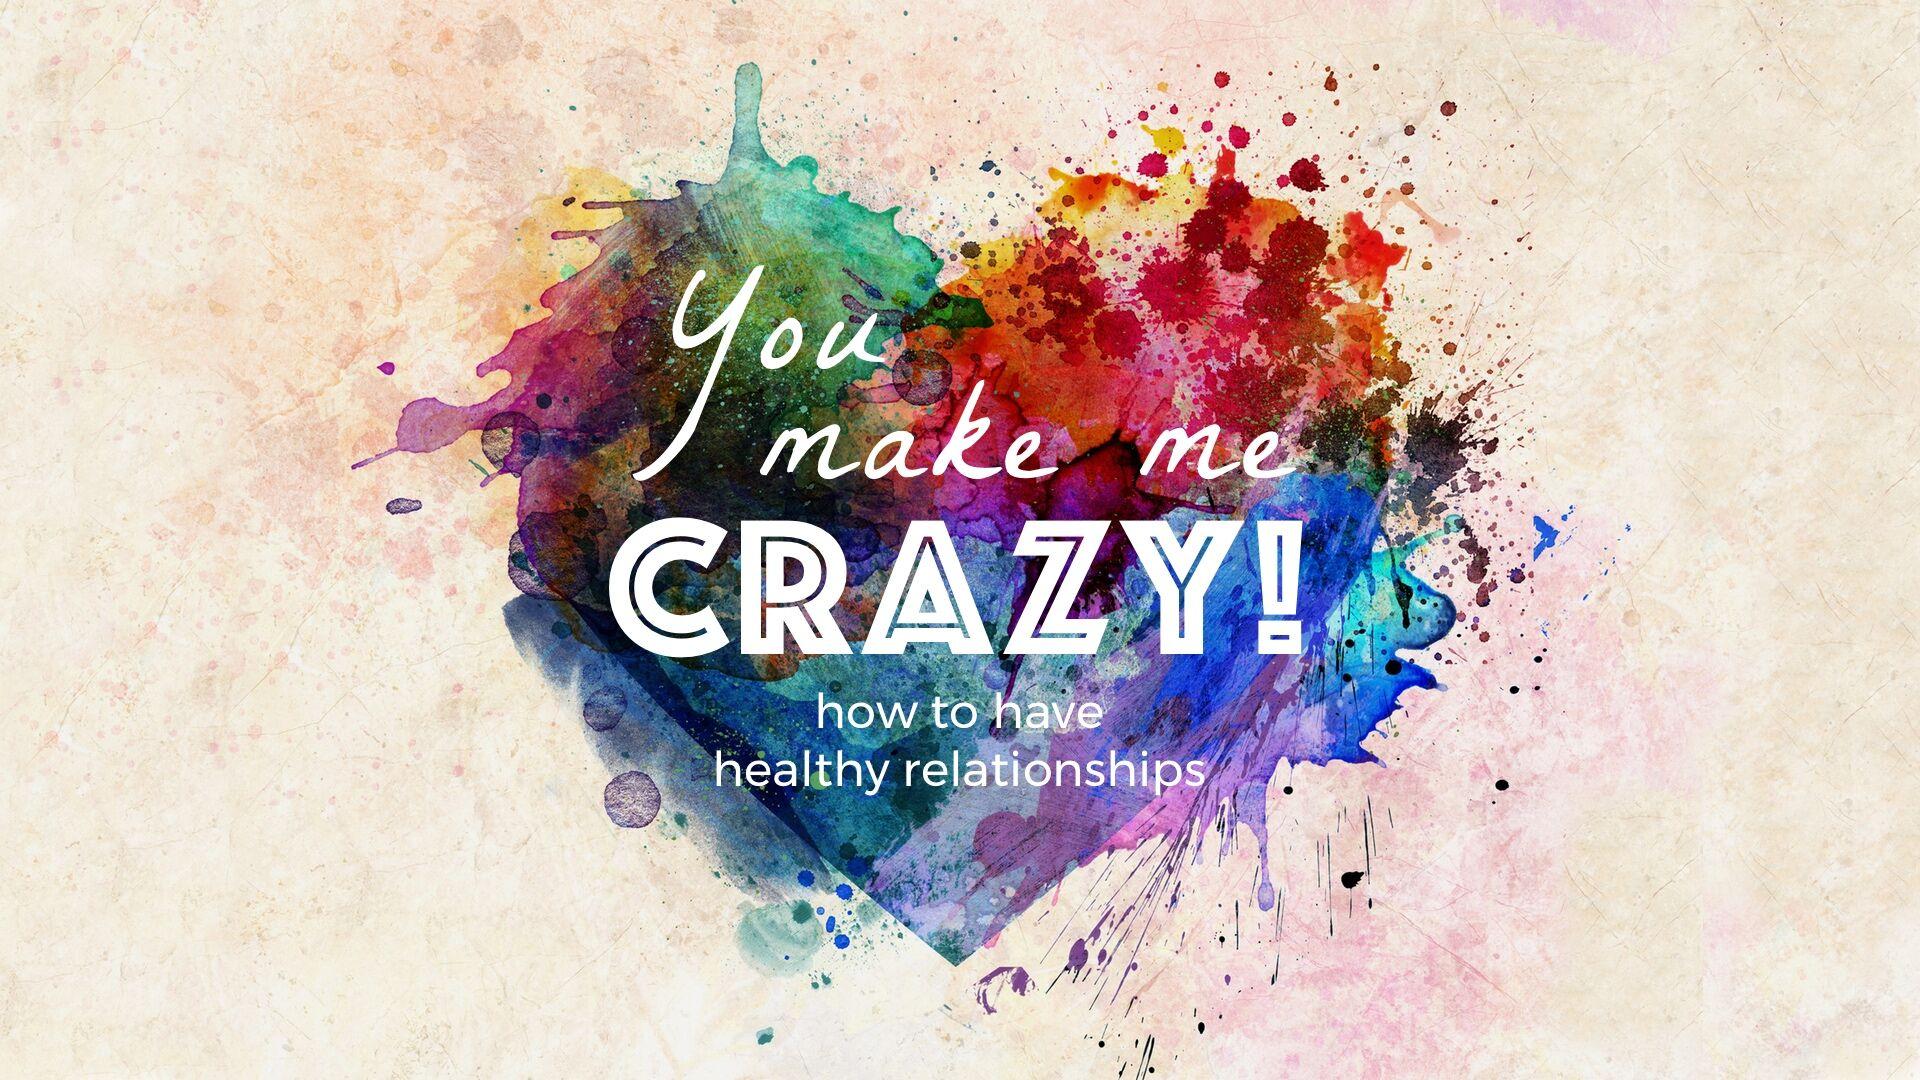 you make me crazy (w:subtitle).jpeg